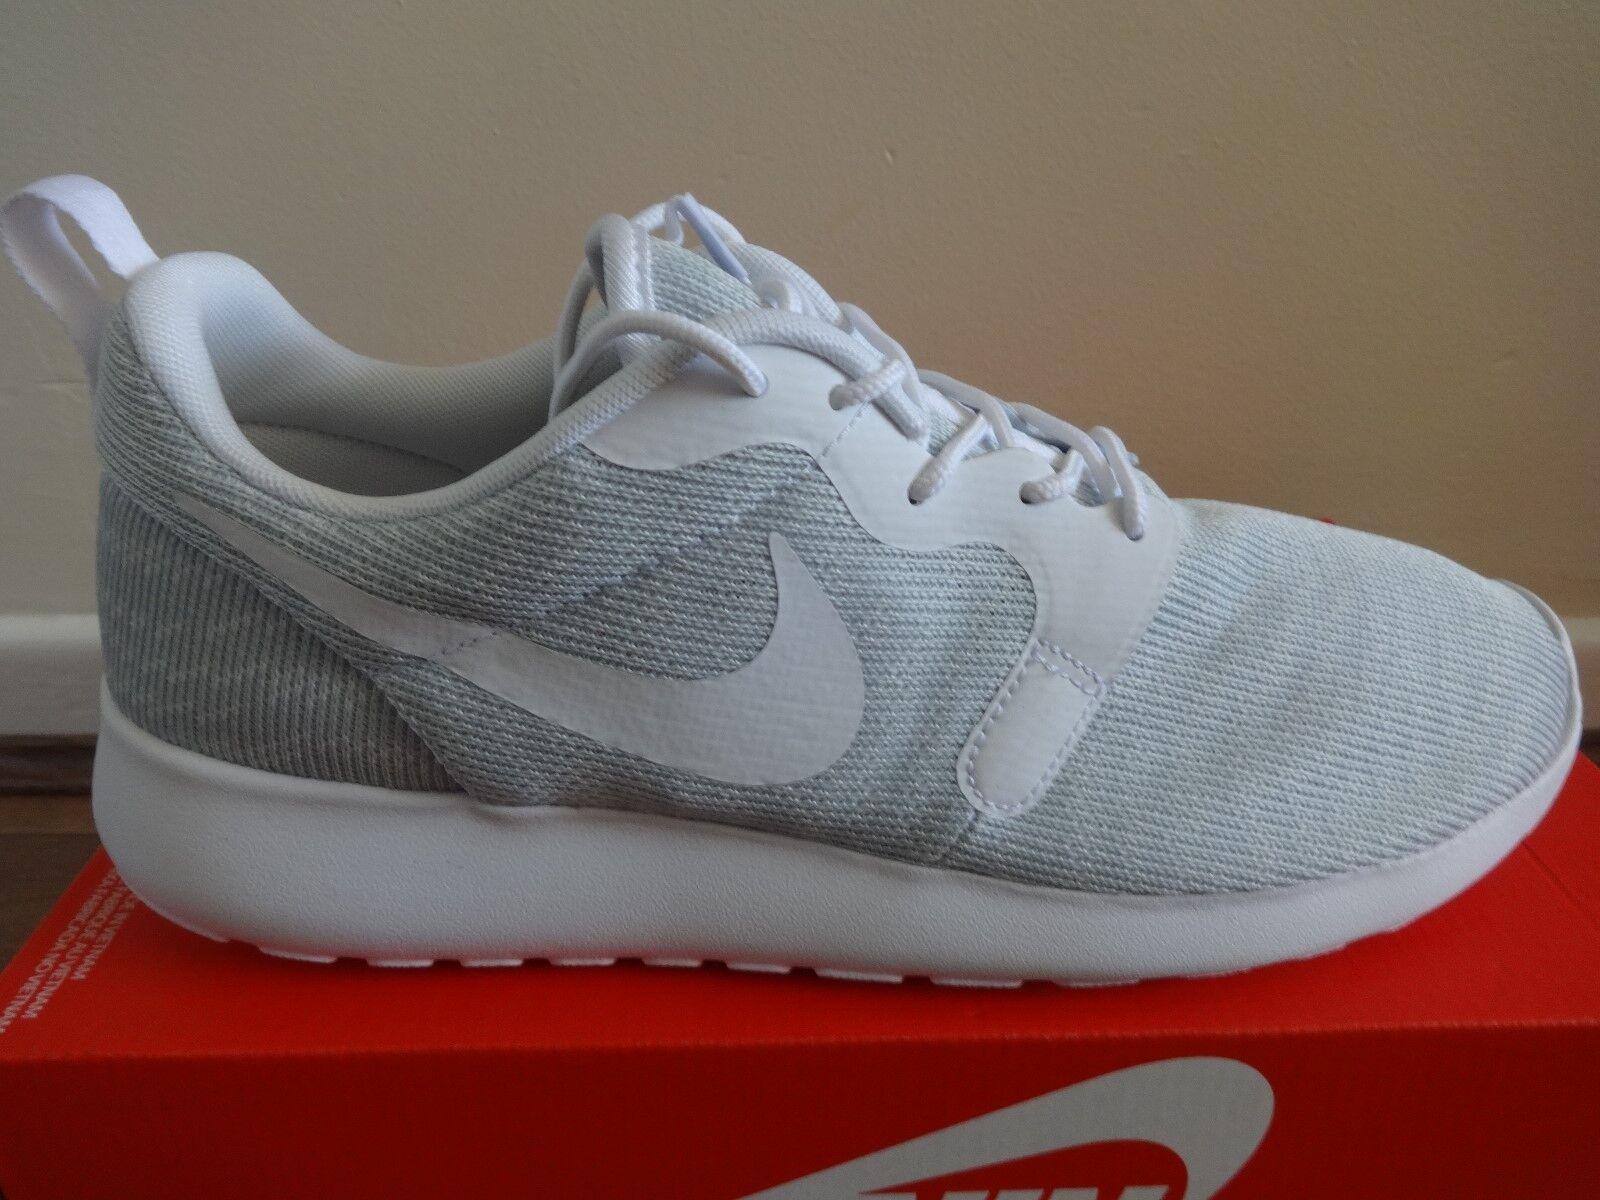 hot sale online ed275 72f57 Nike Roshe One KJCRD Sneaker Uomo Scarpe da ginnastica 777429 011 UK 8.5 EU  43 US